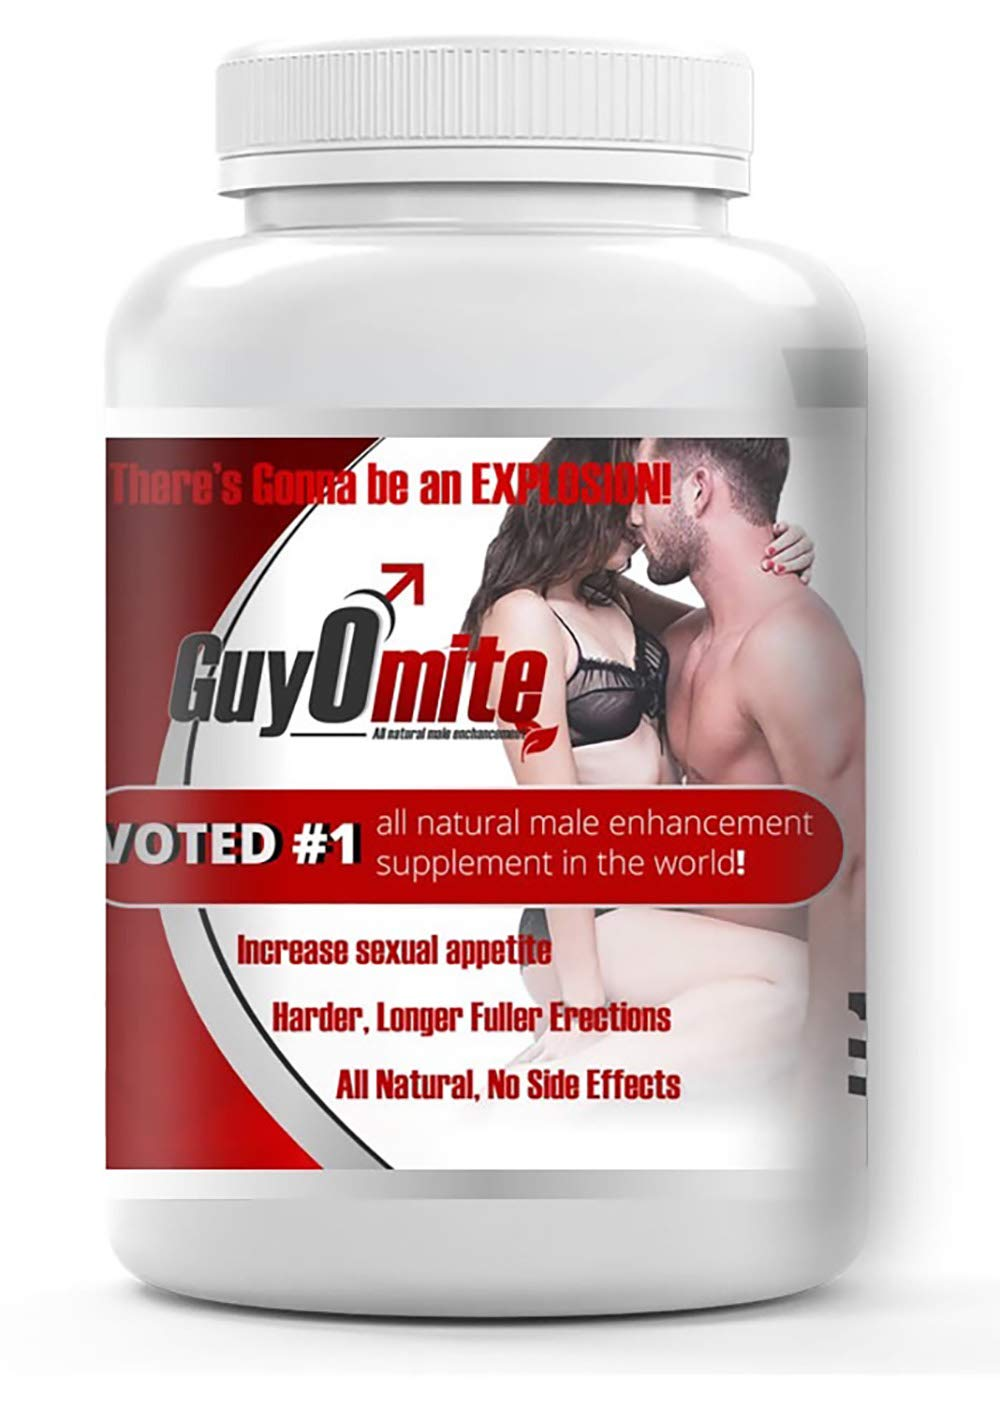 GuyOmite Enhancement Supplements Performance Enlargement